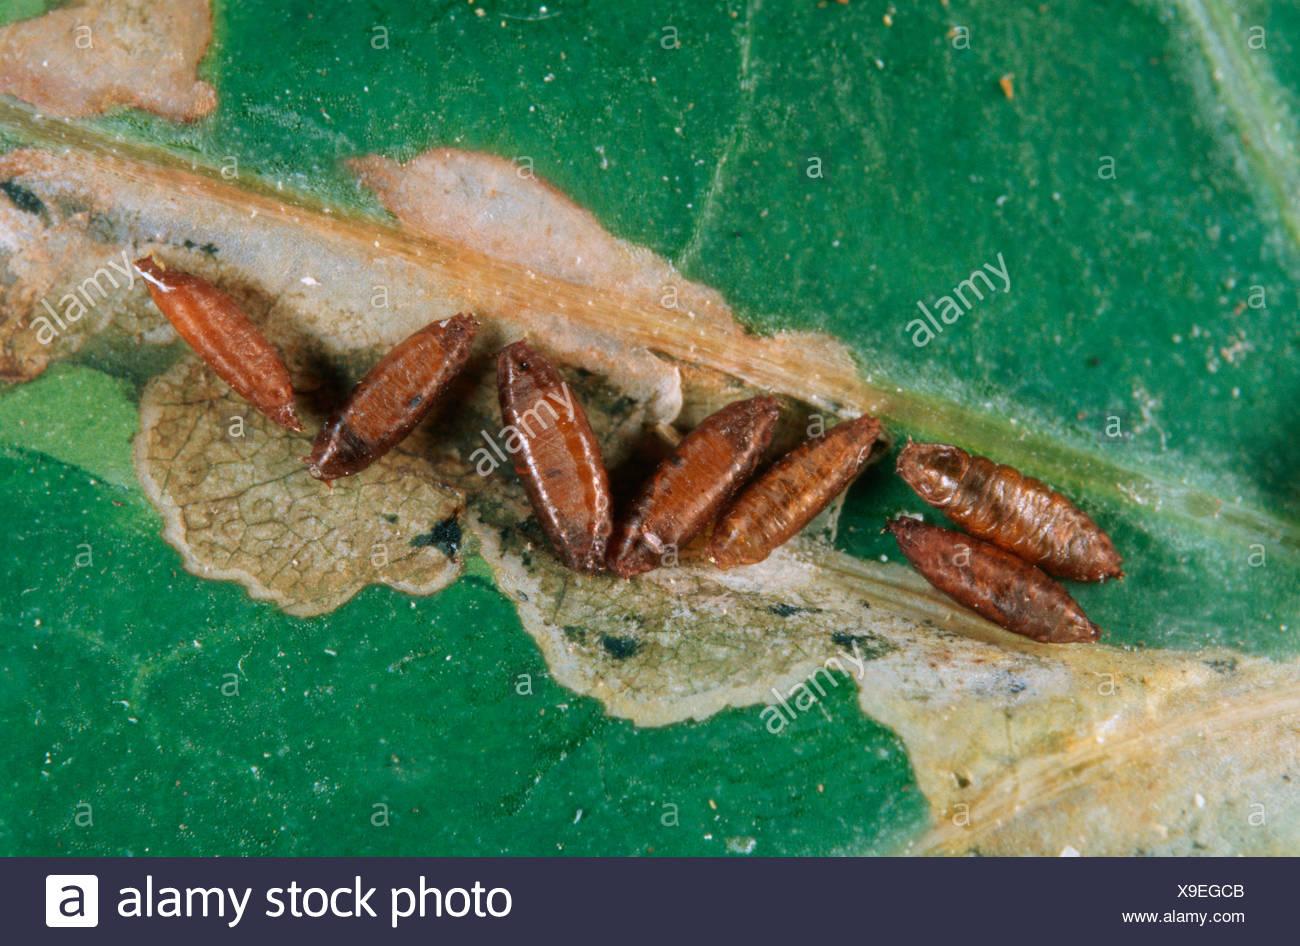 leaf miner (Scaptomyza flava ), pupas, pest on cabbage, Germany - Stock Image